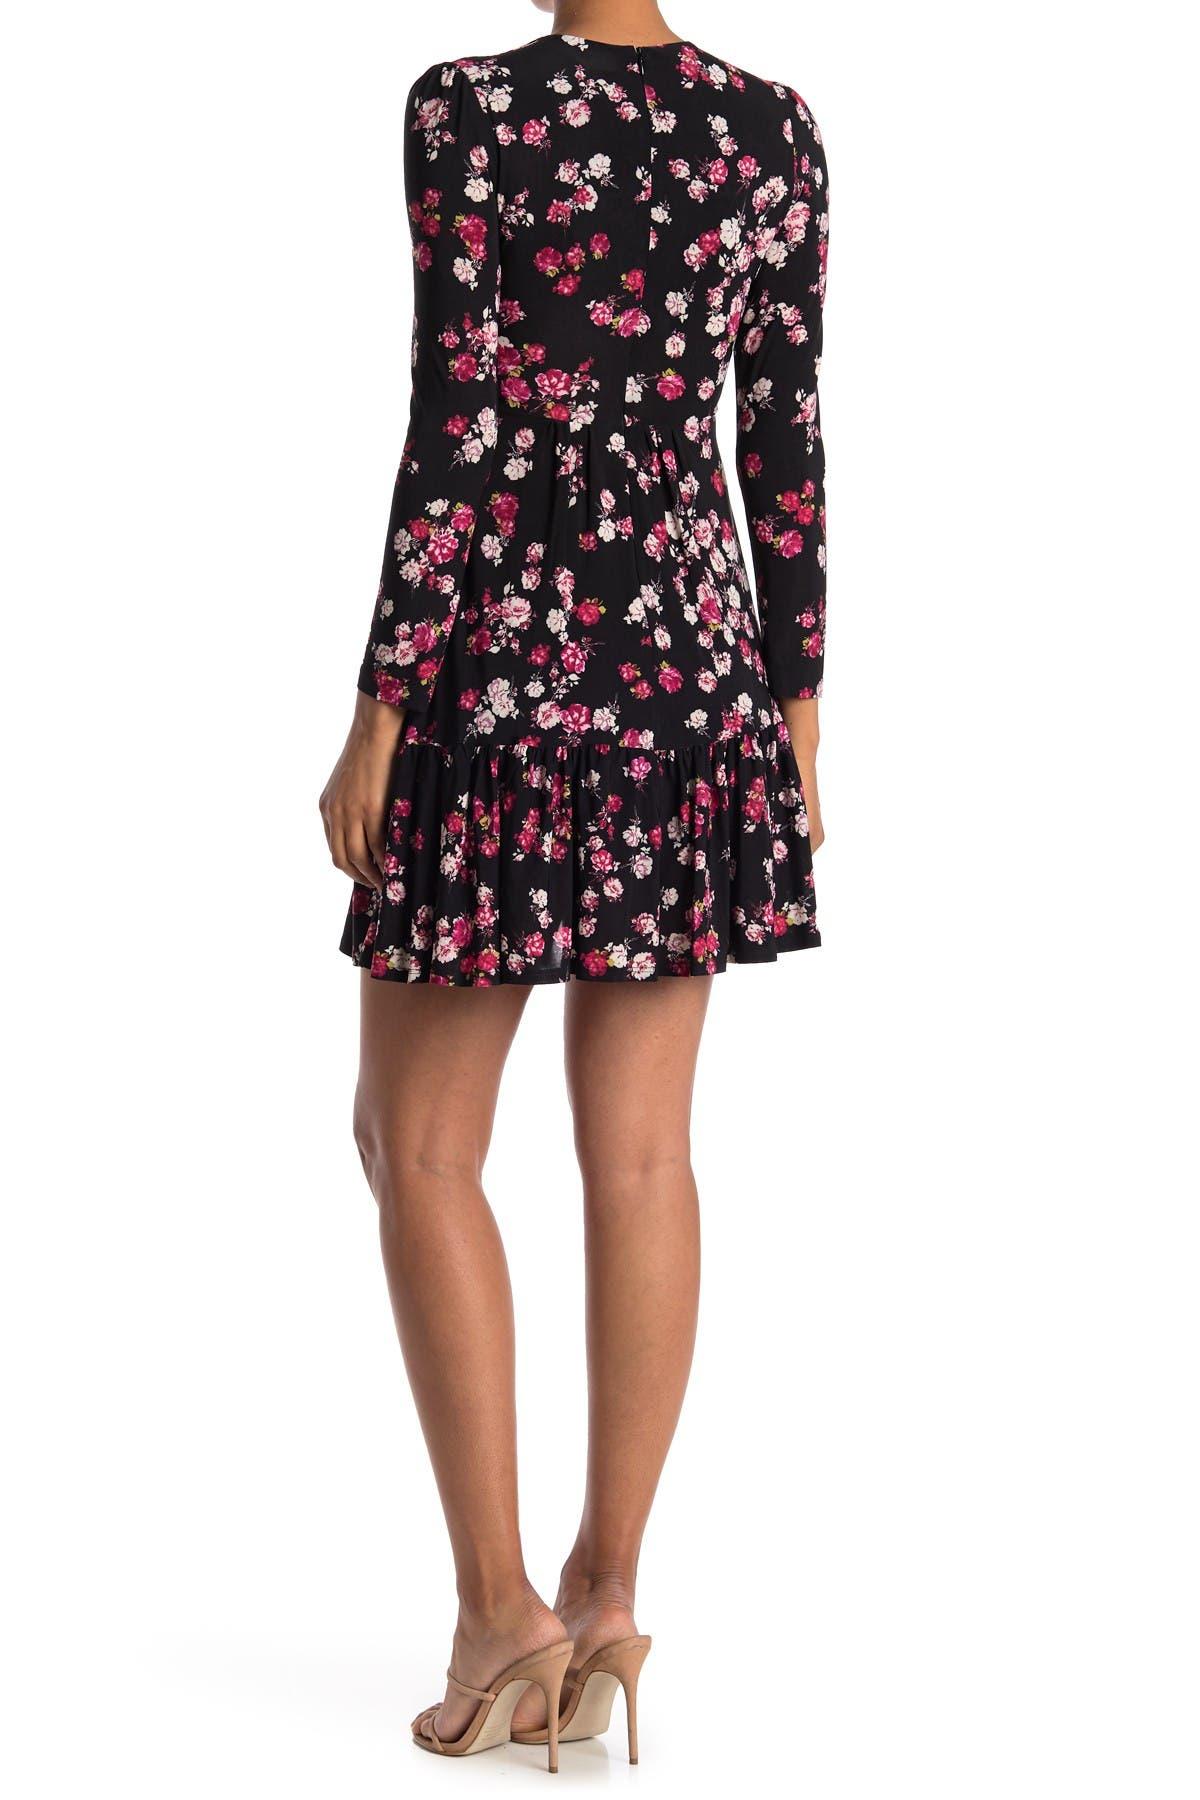 Image of Gabby Skye Long Sleeve Floral Jersey Dress